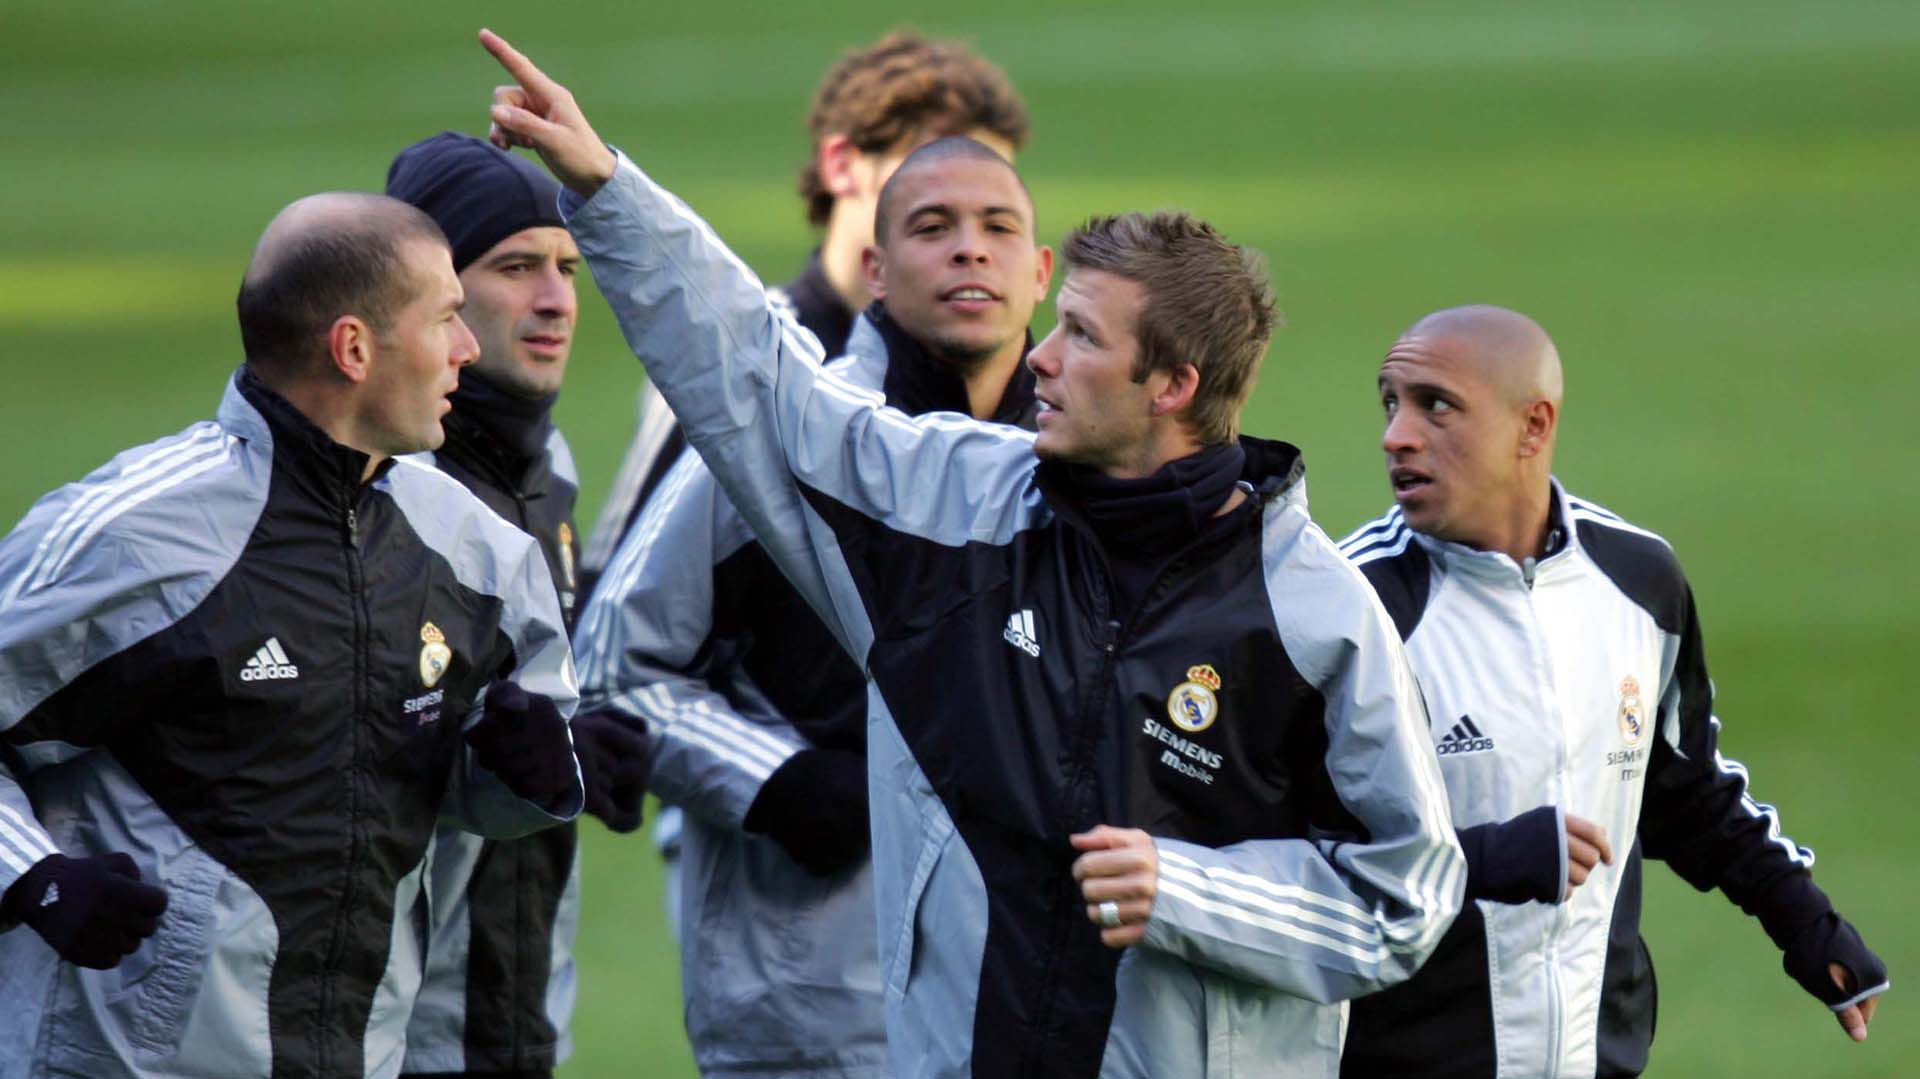 Real Madrid Galácticos